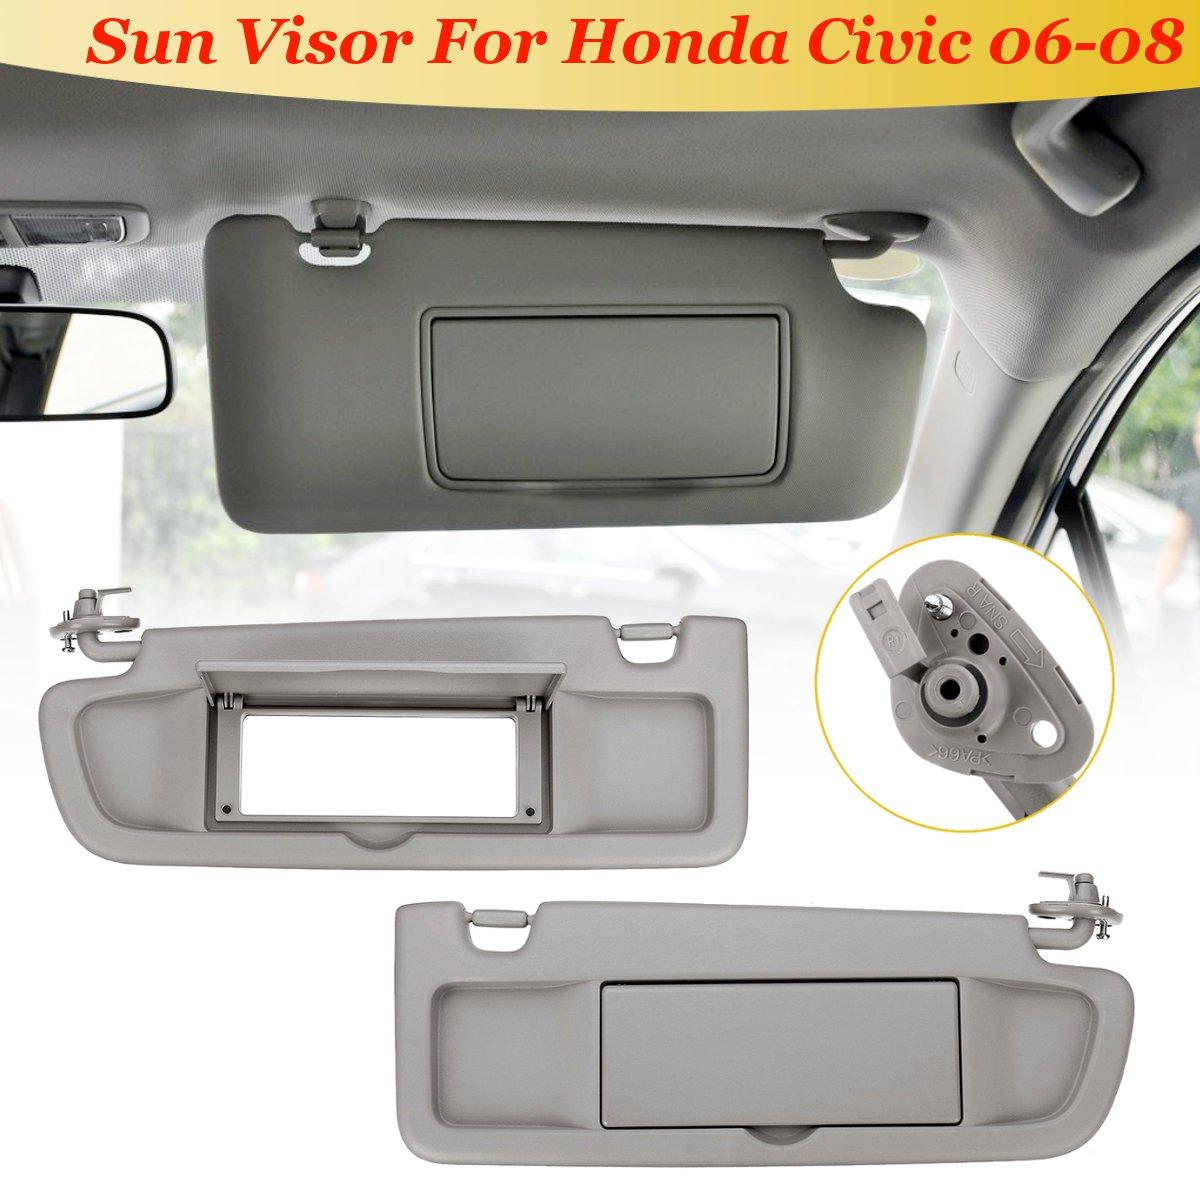 For Honda for Civic for Coupe Sedan 2006 2007 2008 1 Pcs Car LHD Sunvisor  Sunshade Sun Shield Antidazzle Visor 83280SNAA01ZA-in Sun Visors from  Automobiles ... 236d0c89c8f